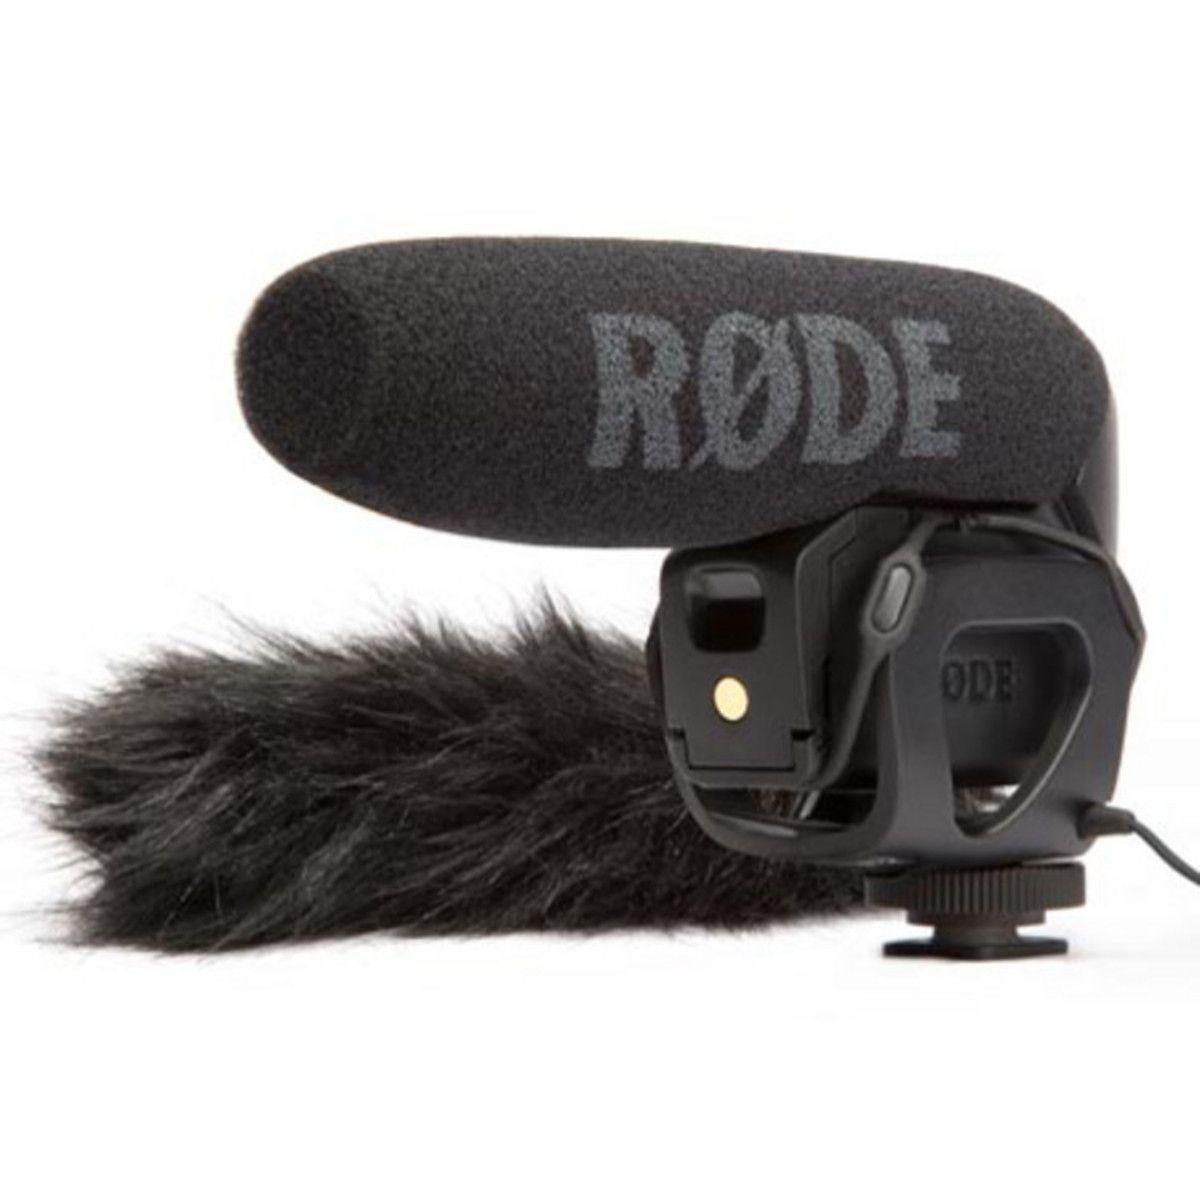 Rode Dead Cat VideoMic Windshield (Videomic Pro-R)